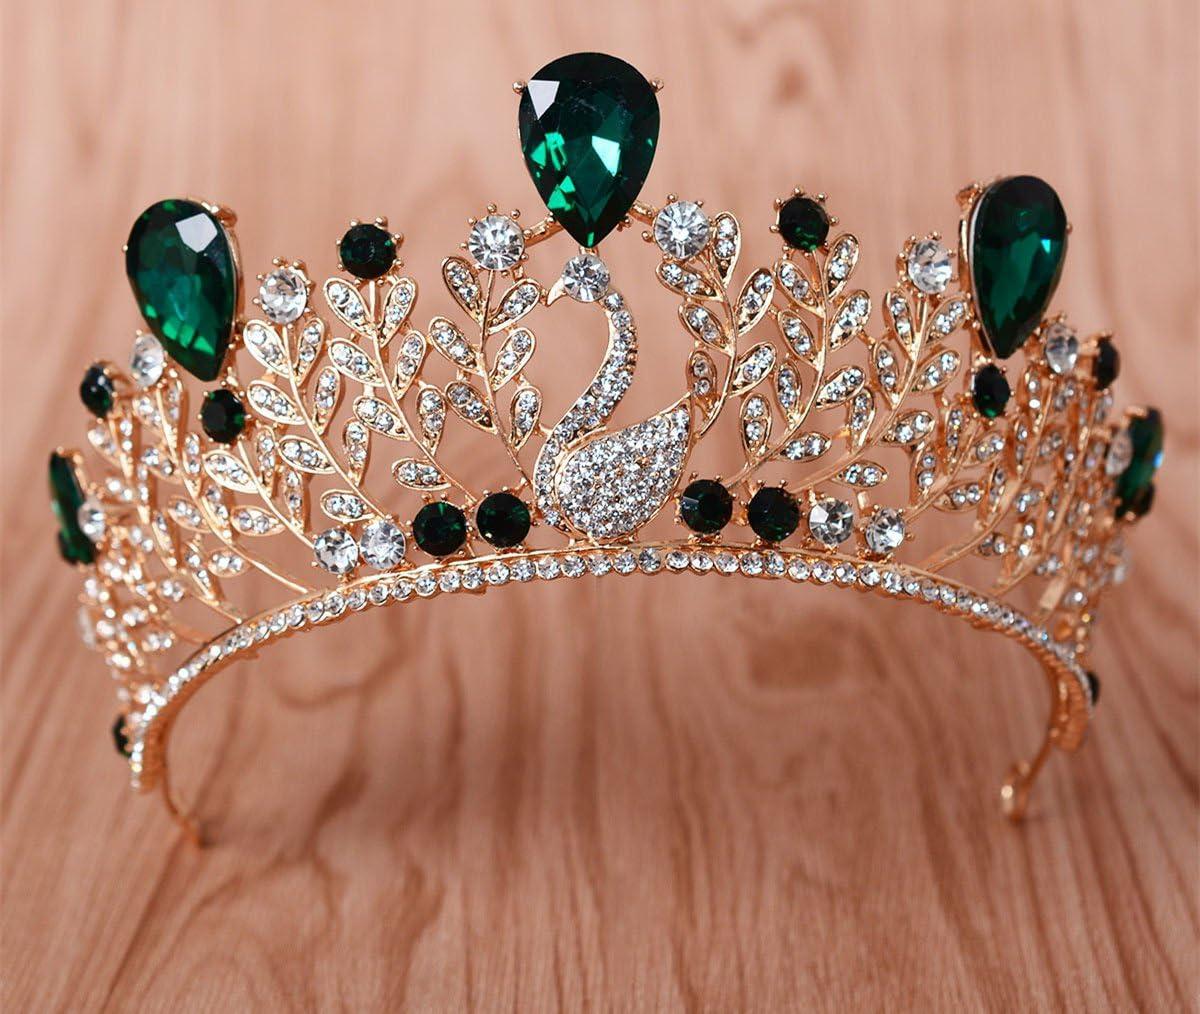 kphy-coreano Corona Joyas Novia Azul Phoenix Corona Reina Princesa cabeza Ornamento Corona Fase Ornamento Vestido Accesorios, verde: Amazon.es: Deportes y aire libre